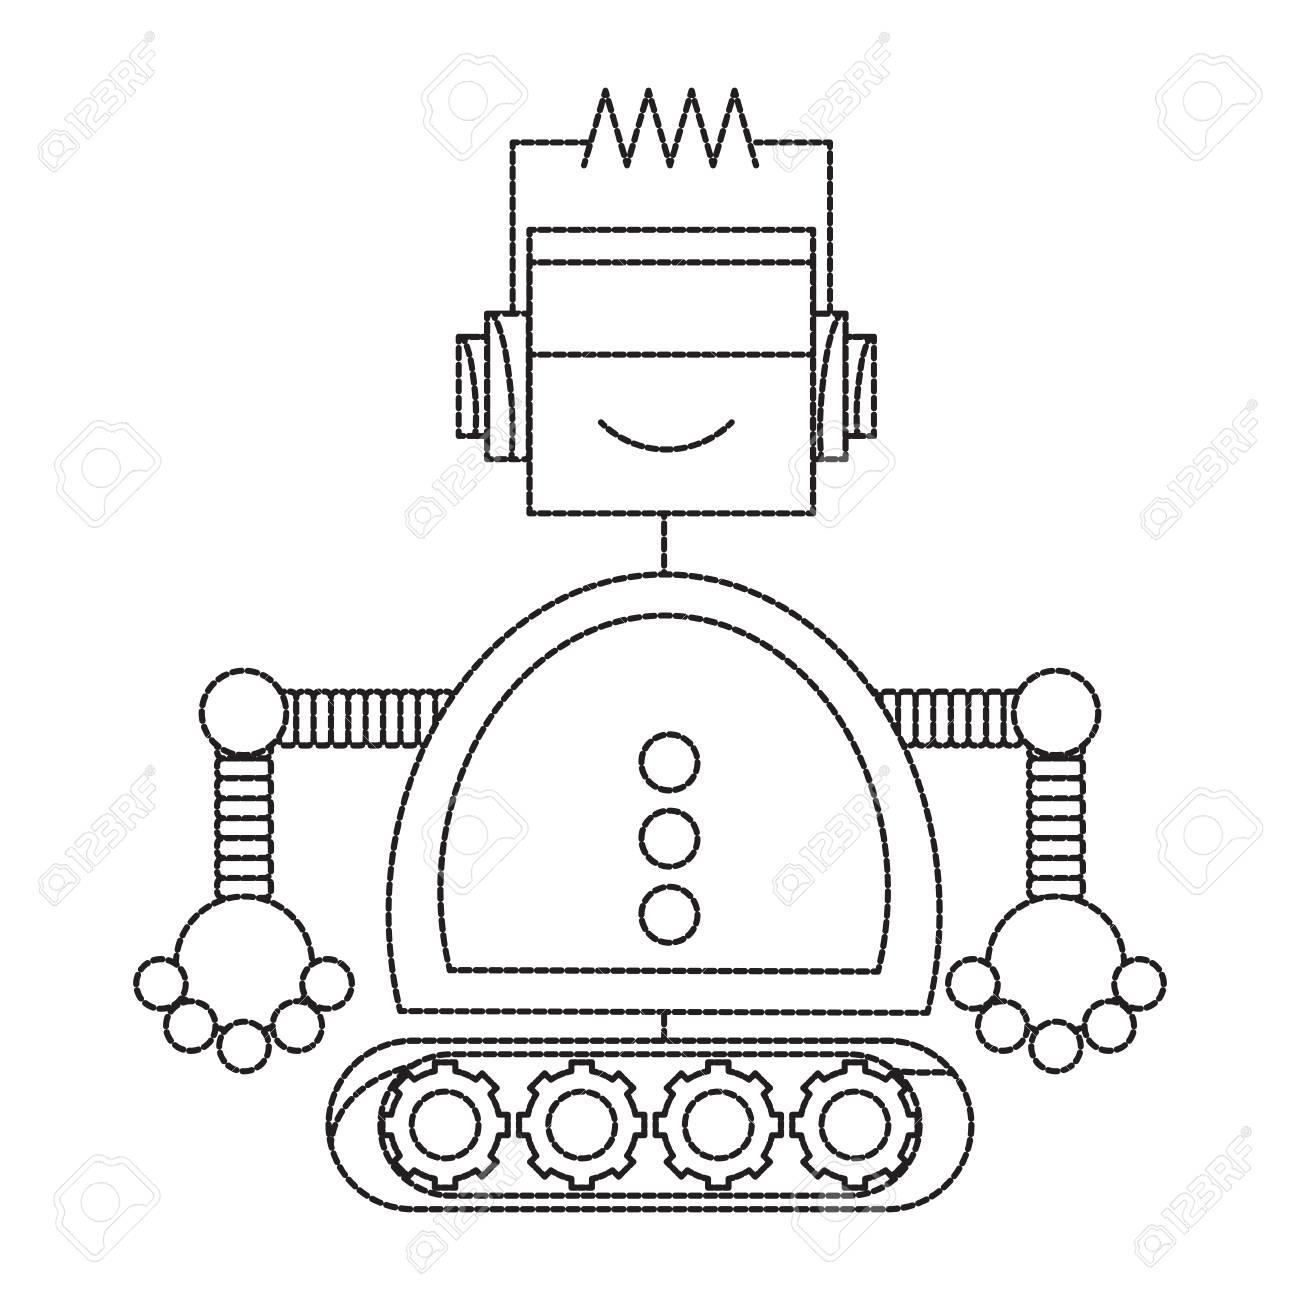 Cartoon Robot Icon Over White Background Black And White Design